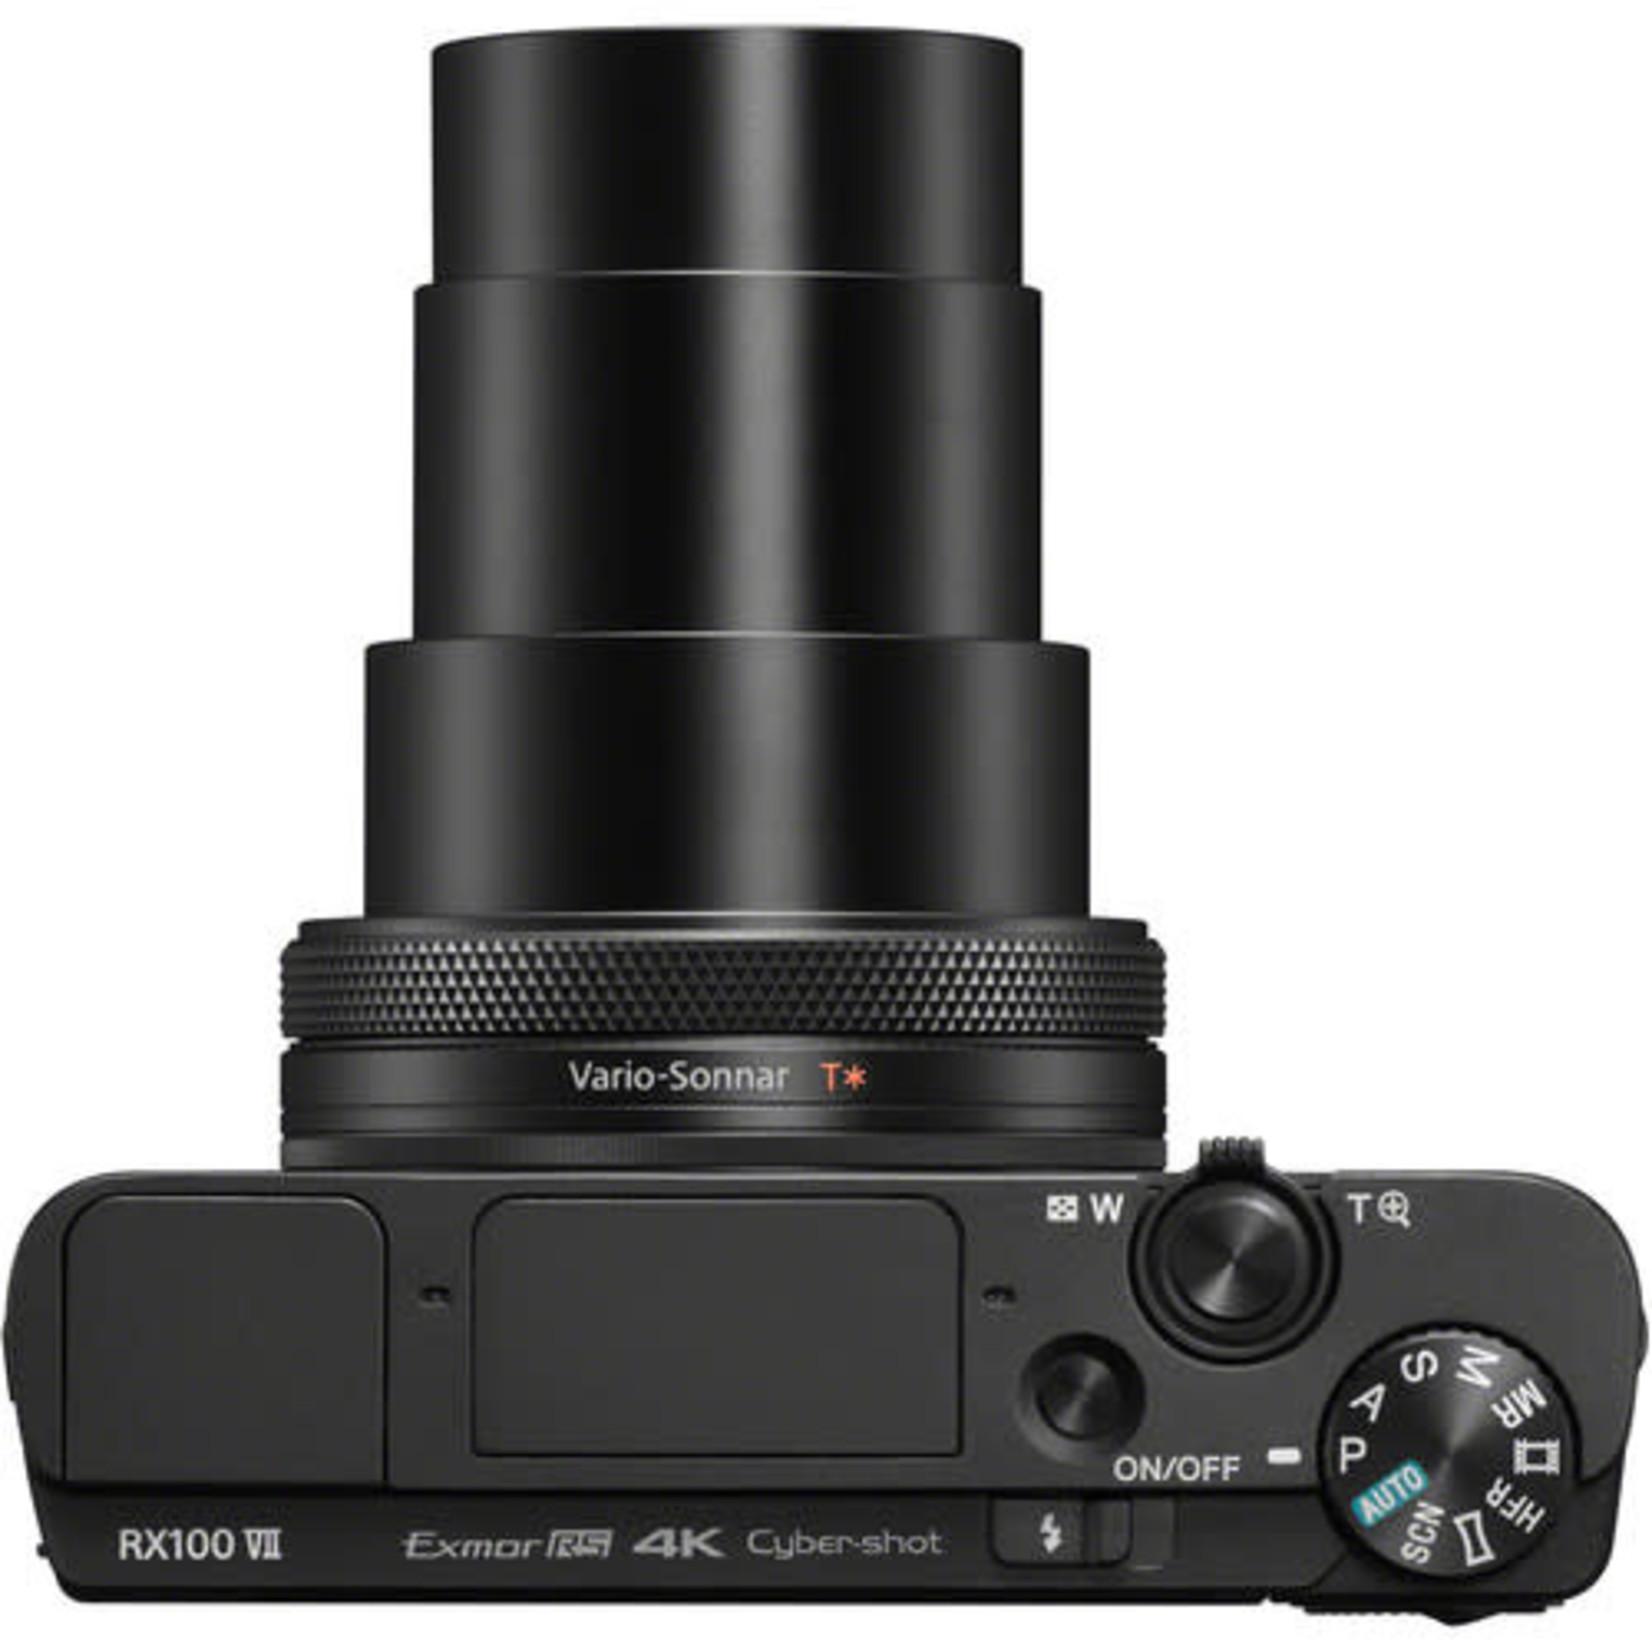 Sony Sony Cyber-shot DSC-RX100 VII Digital Camera